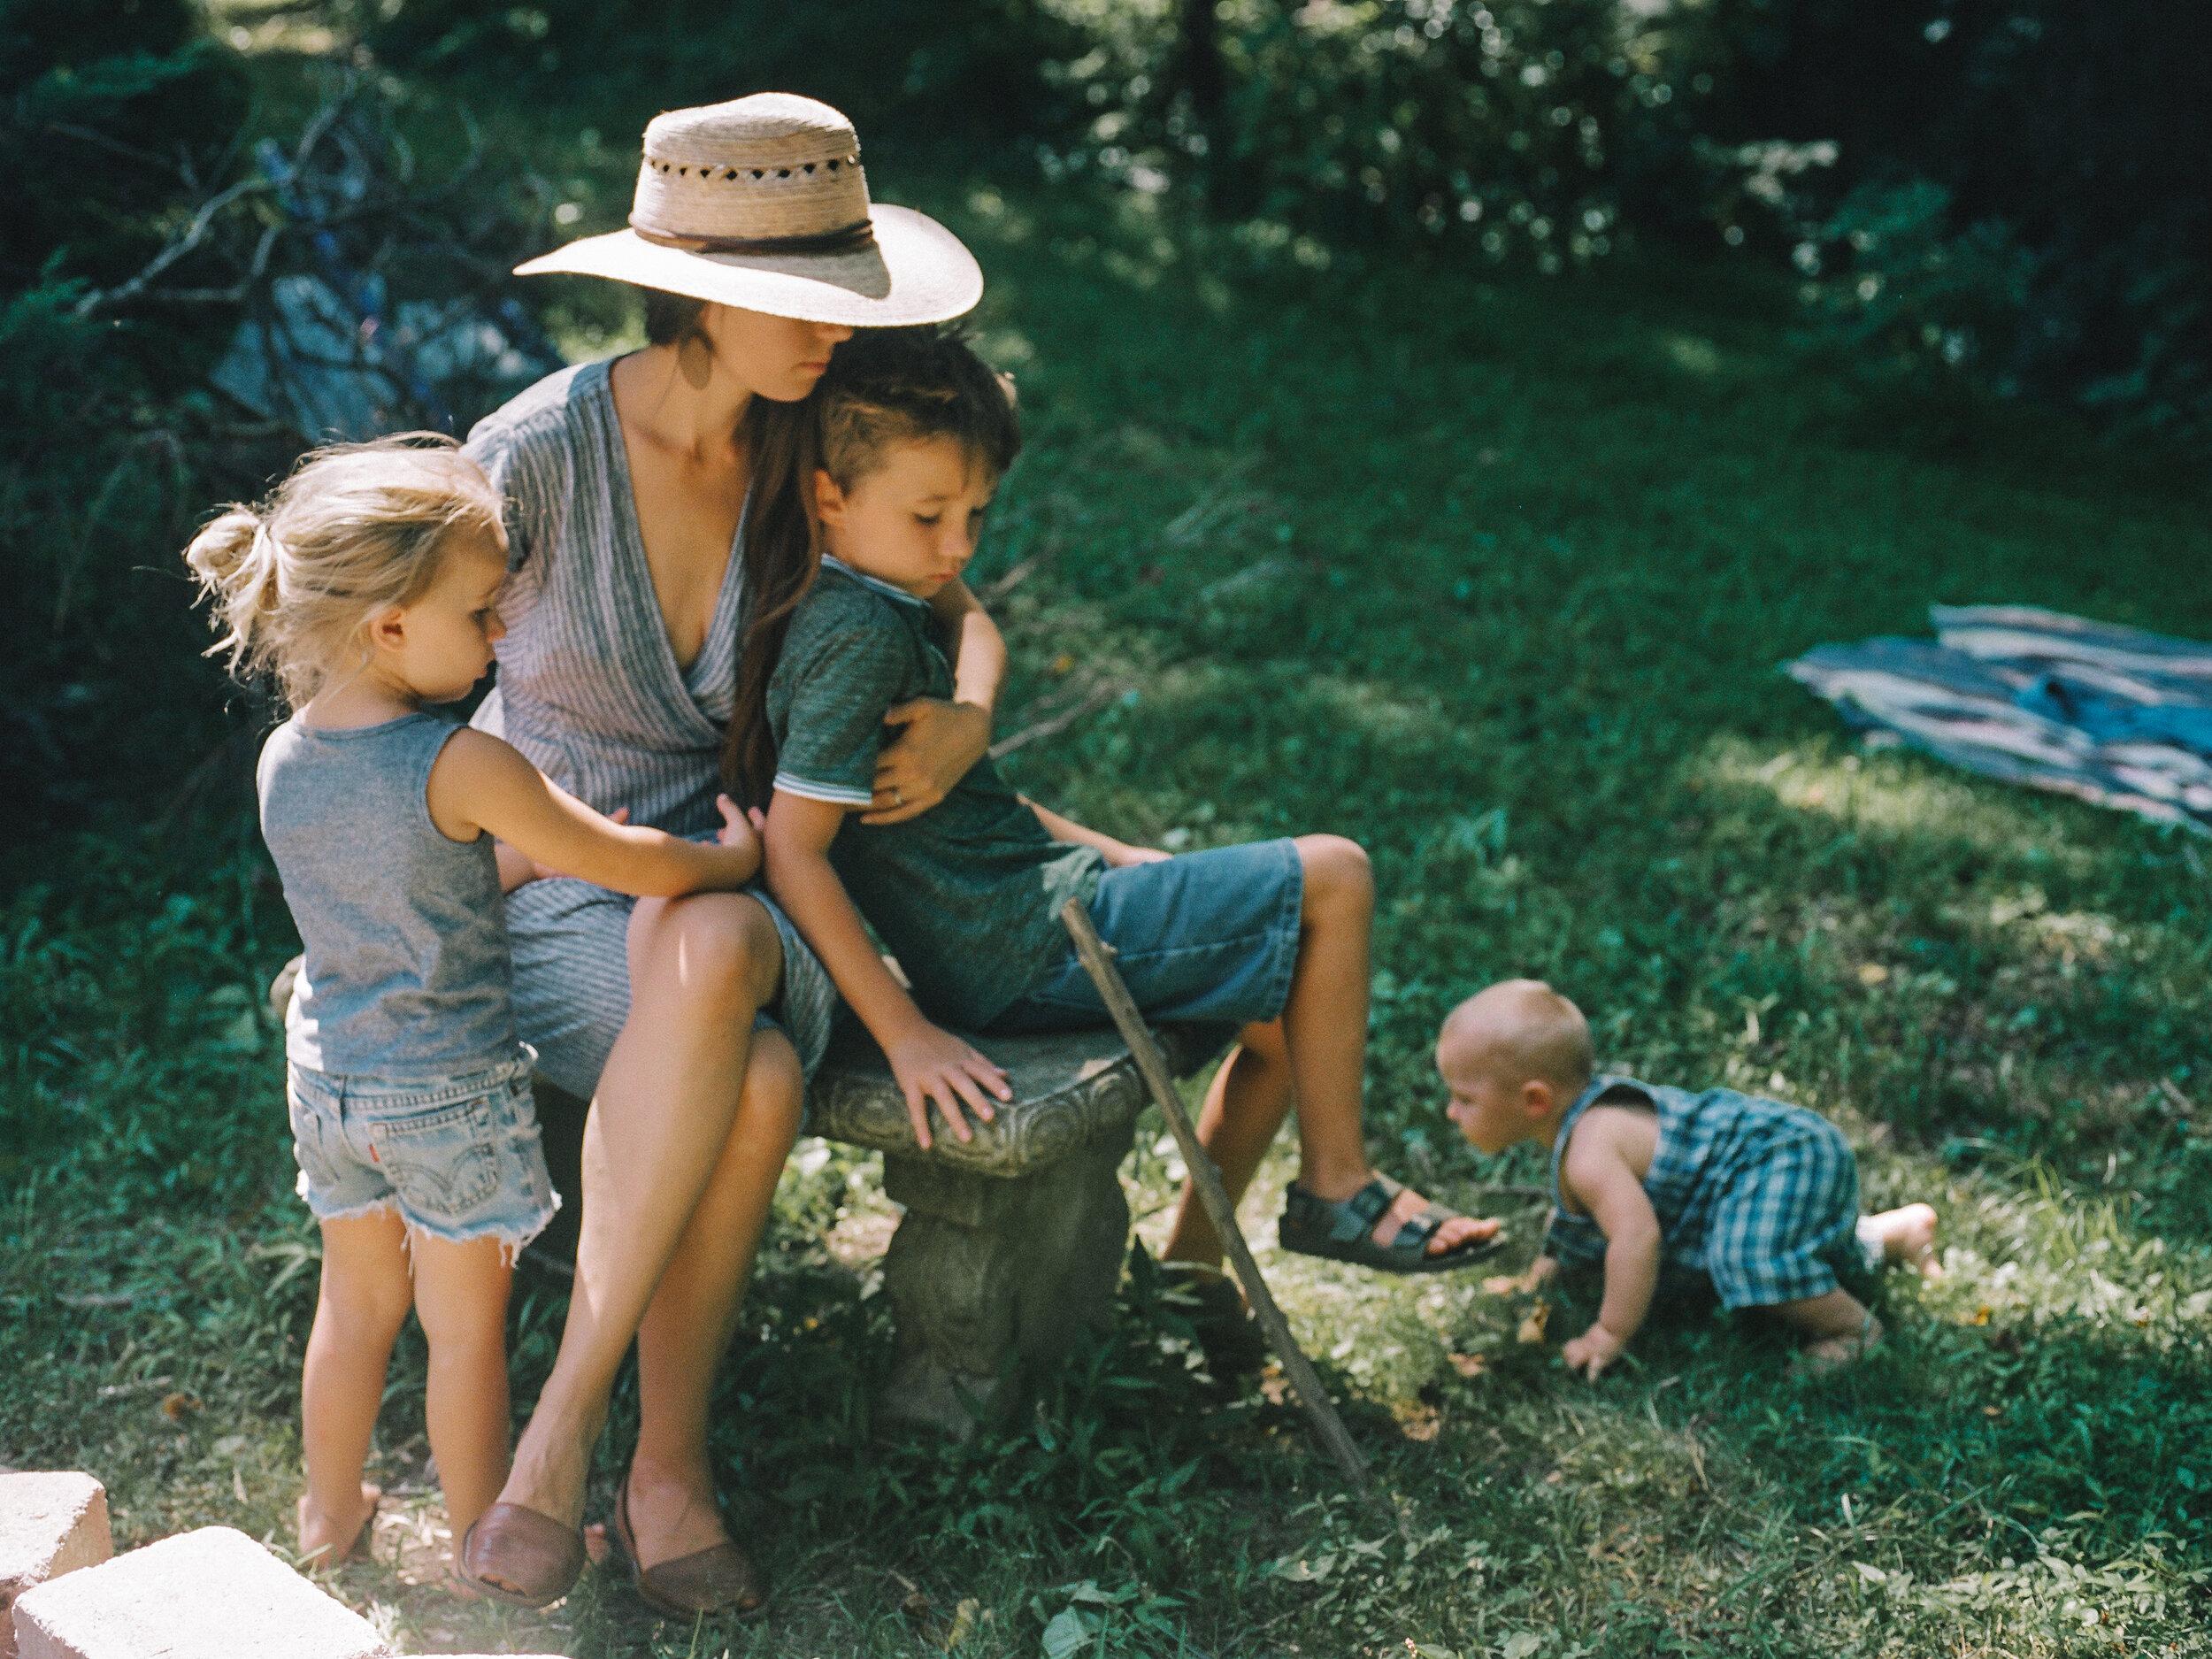 mother of boys Maryland, virginia, and Washington DC family photographer, film lifestyle photographer